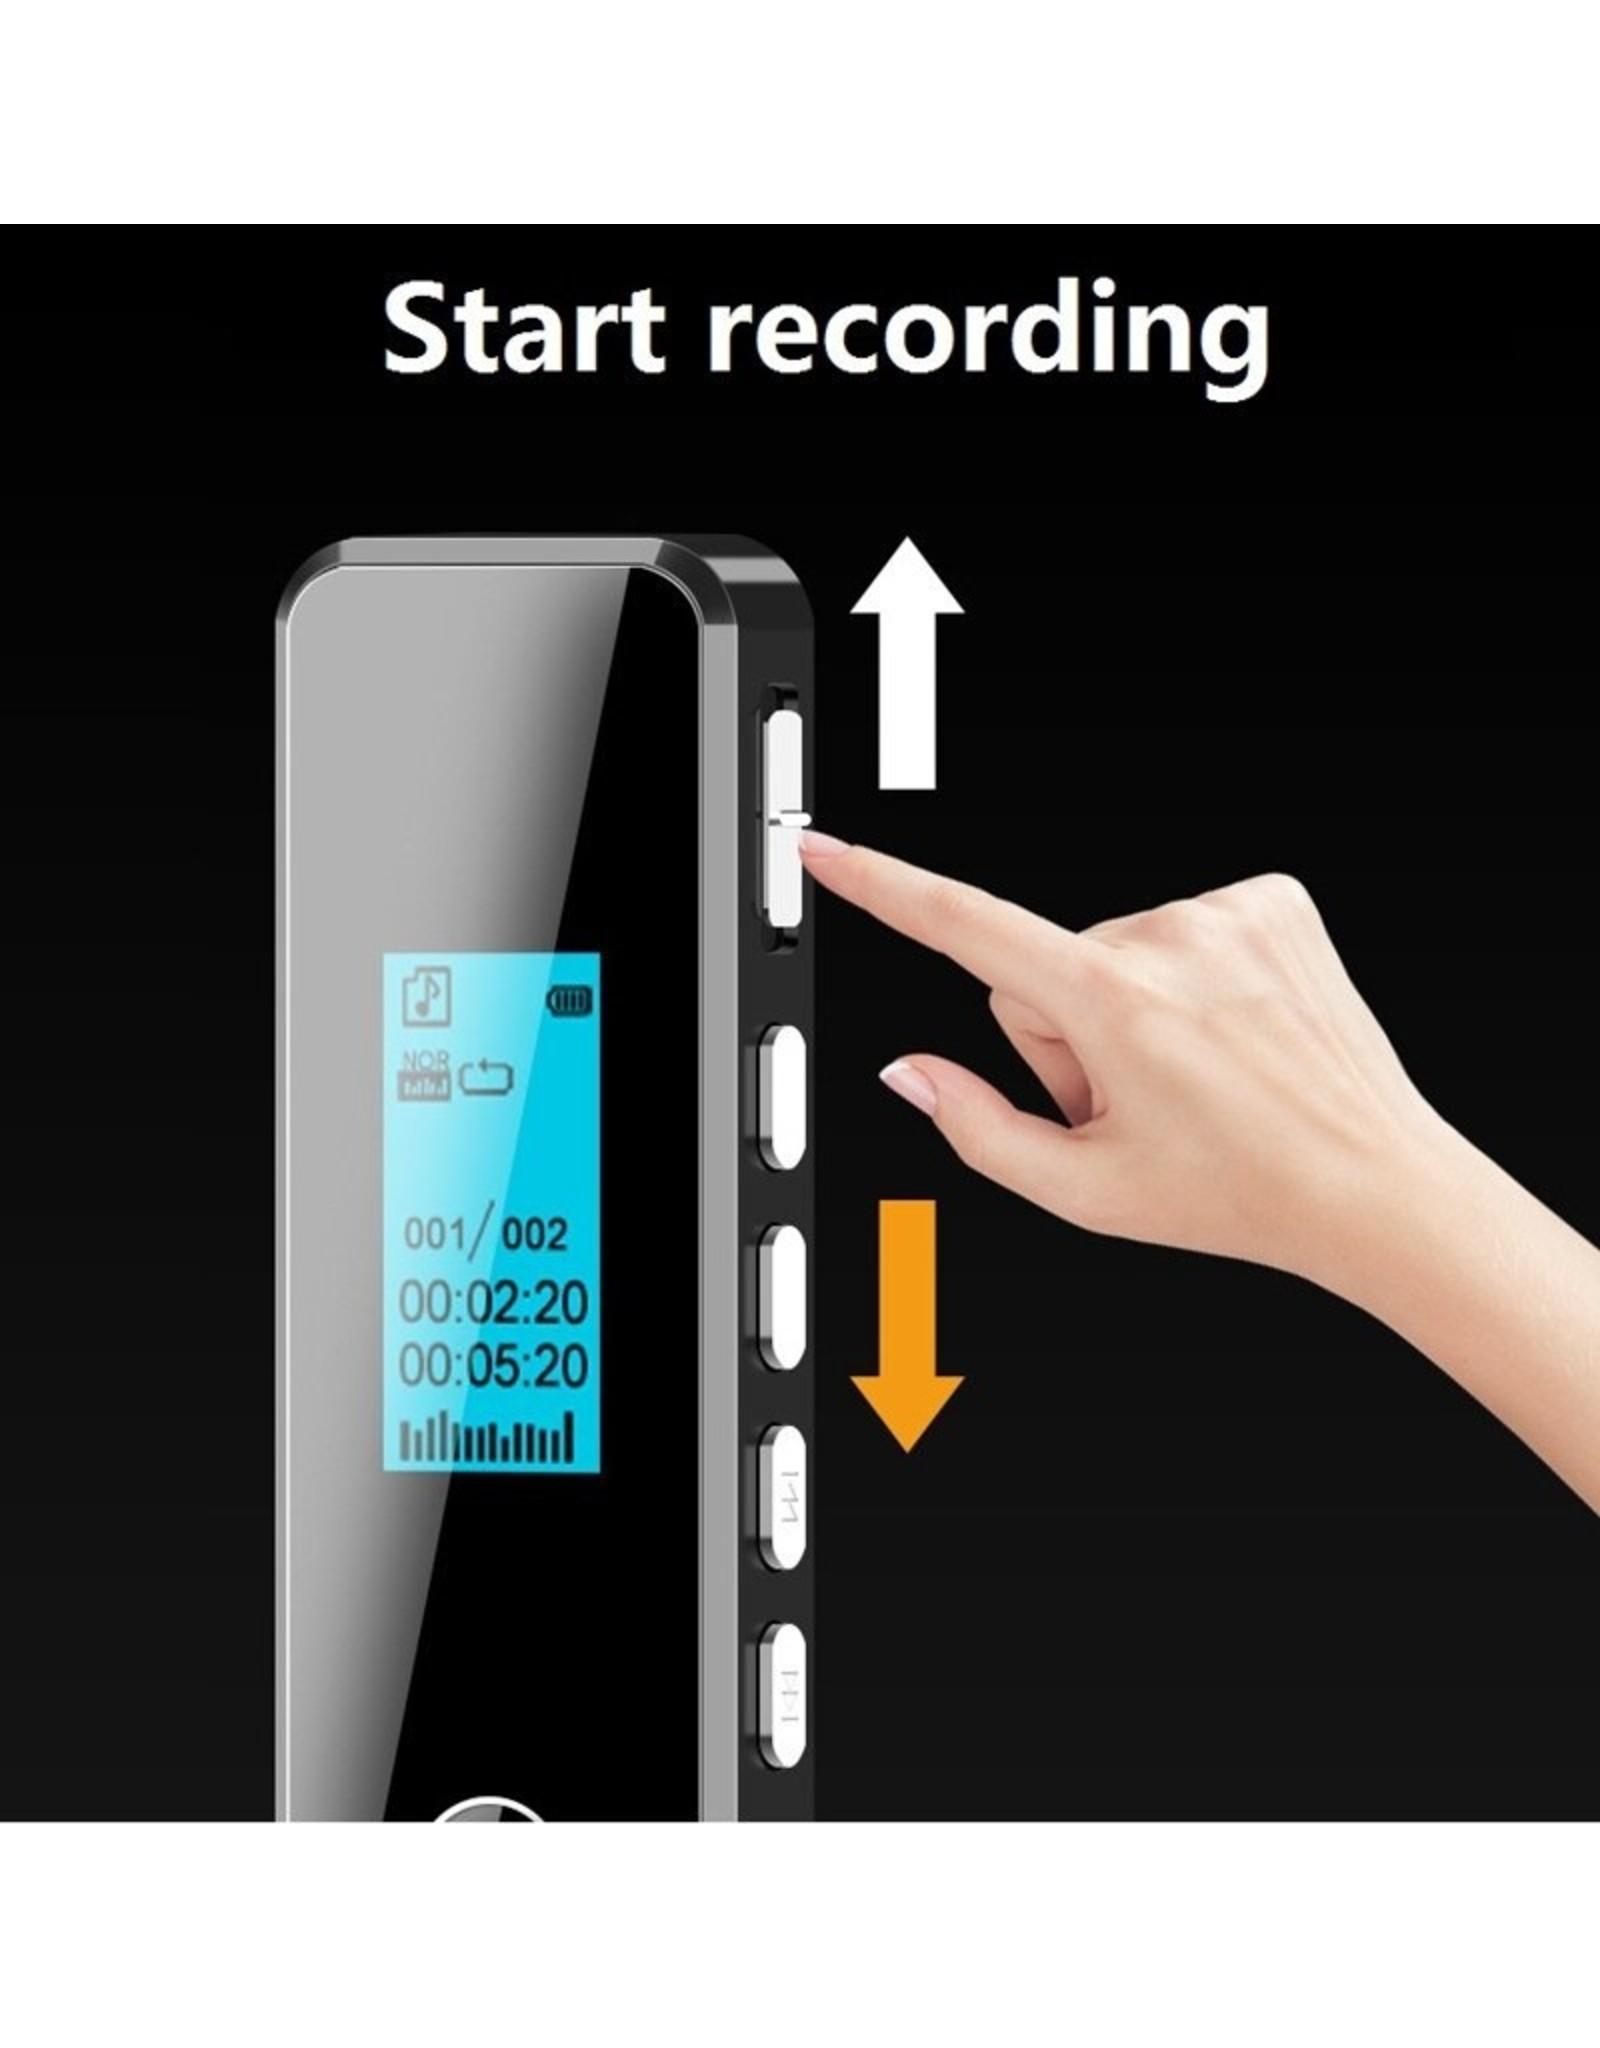 Voice Recorder GB mini Professionele digitale Stereo High Definition voice recorders verborgen afluisteren denoise Flac lossless mini MP3 met WAV, MP3-speler